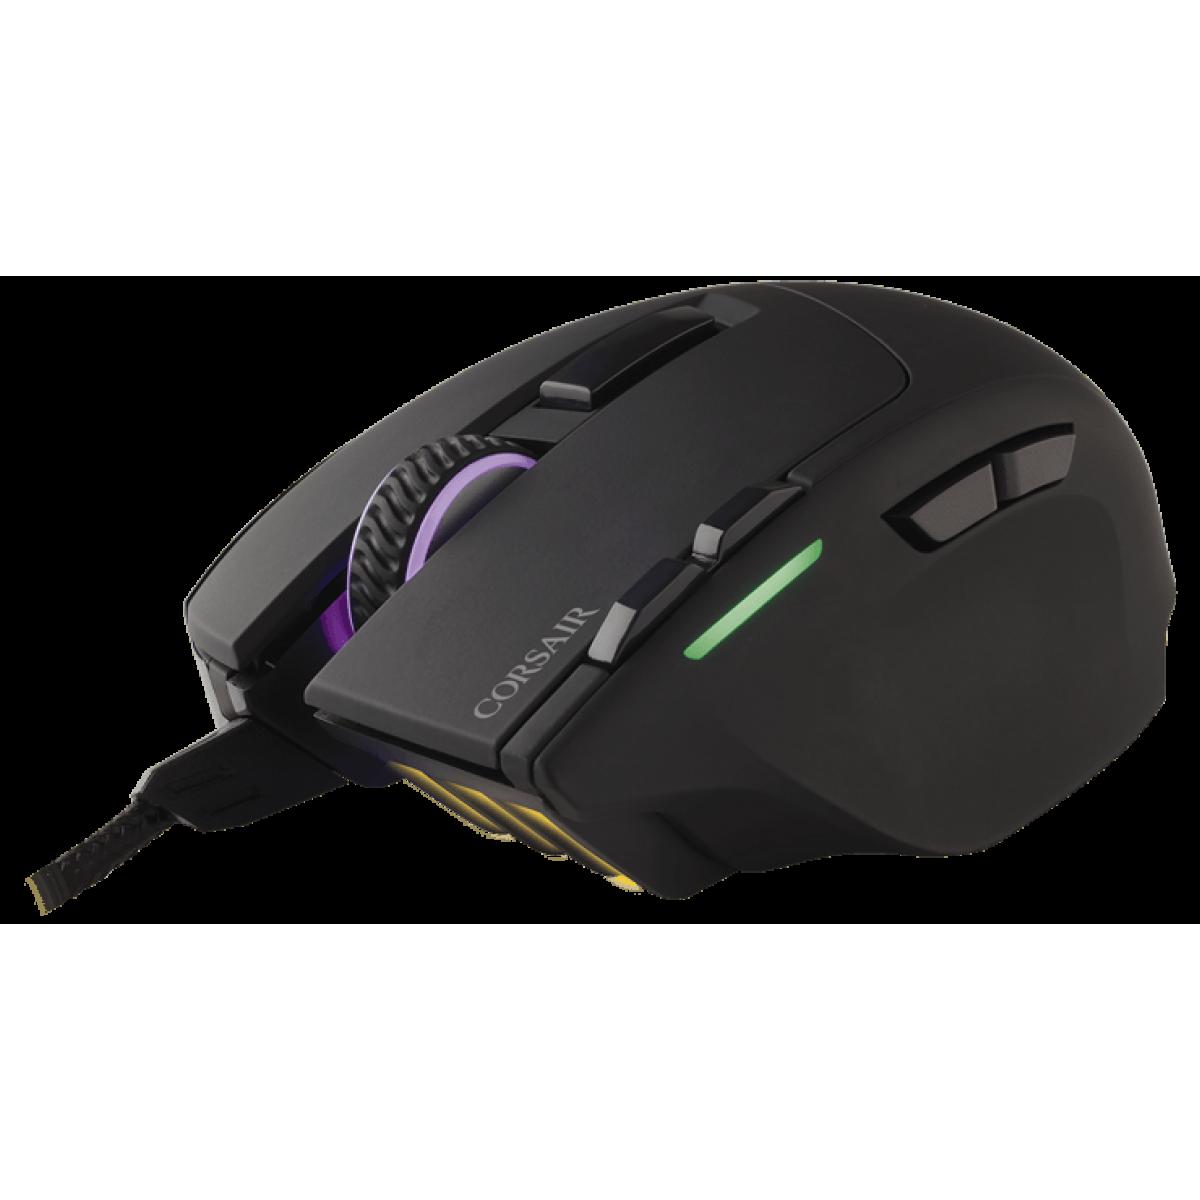 Mouse Corsair Gamer Sabre RGB CH-9303011-NA 8 BOTÕES 10000 DPI